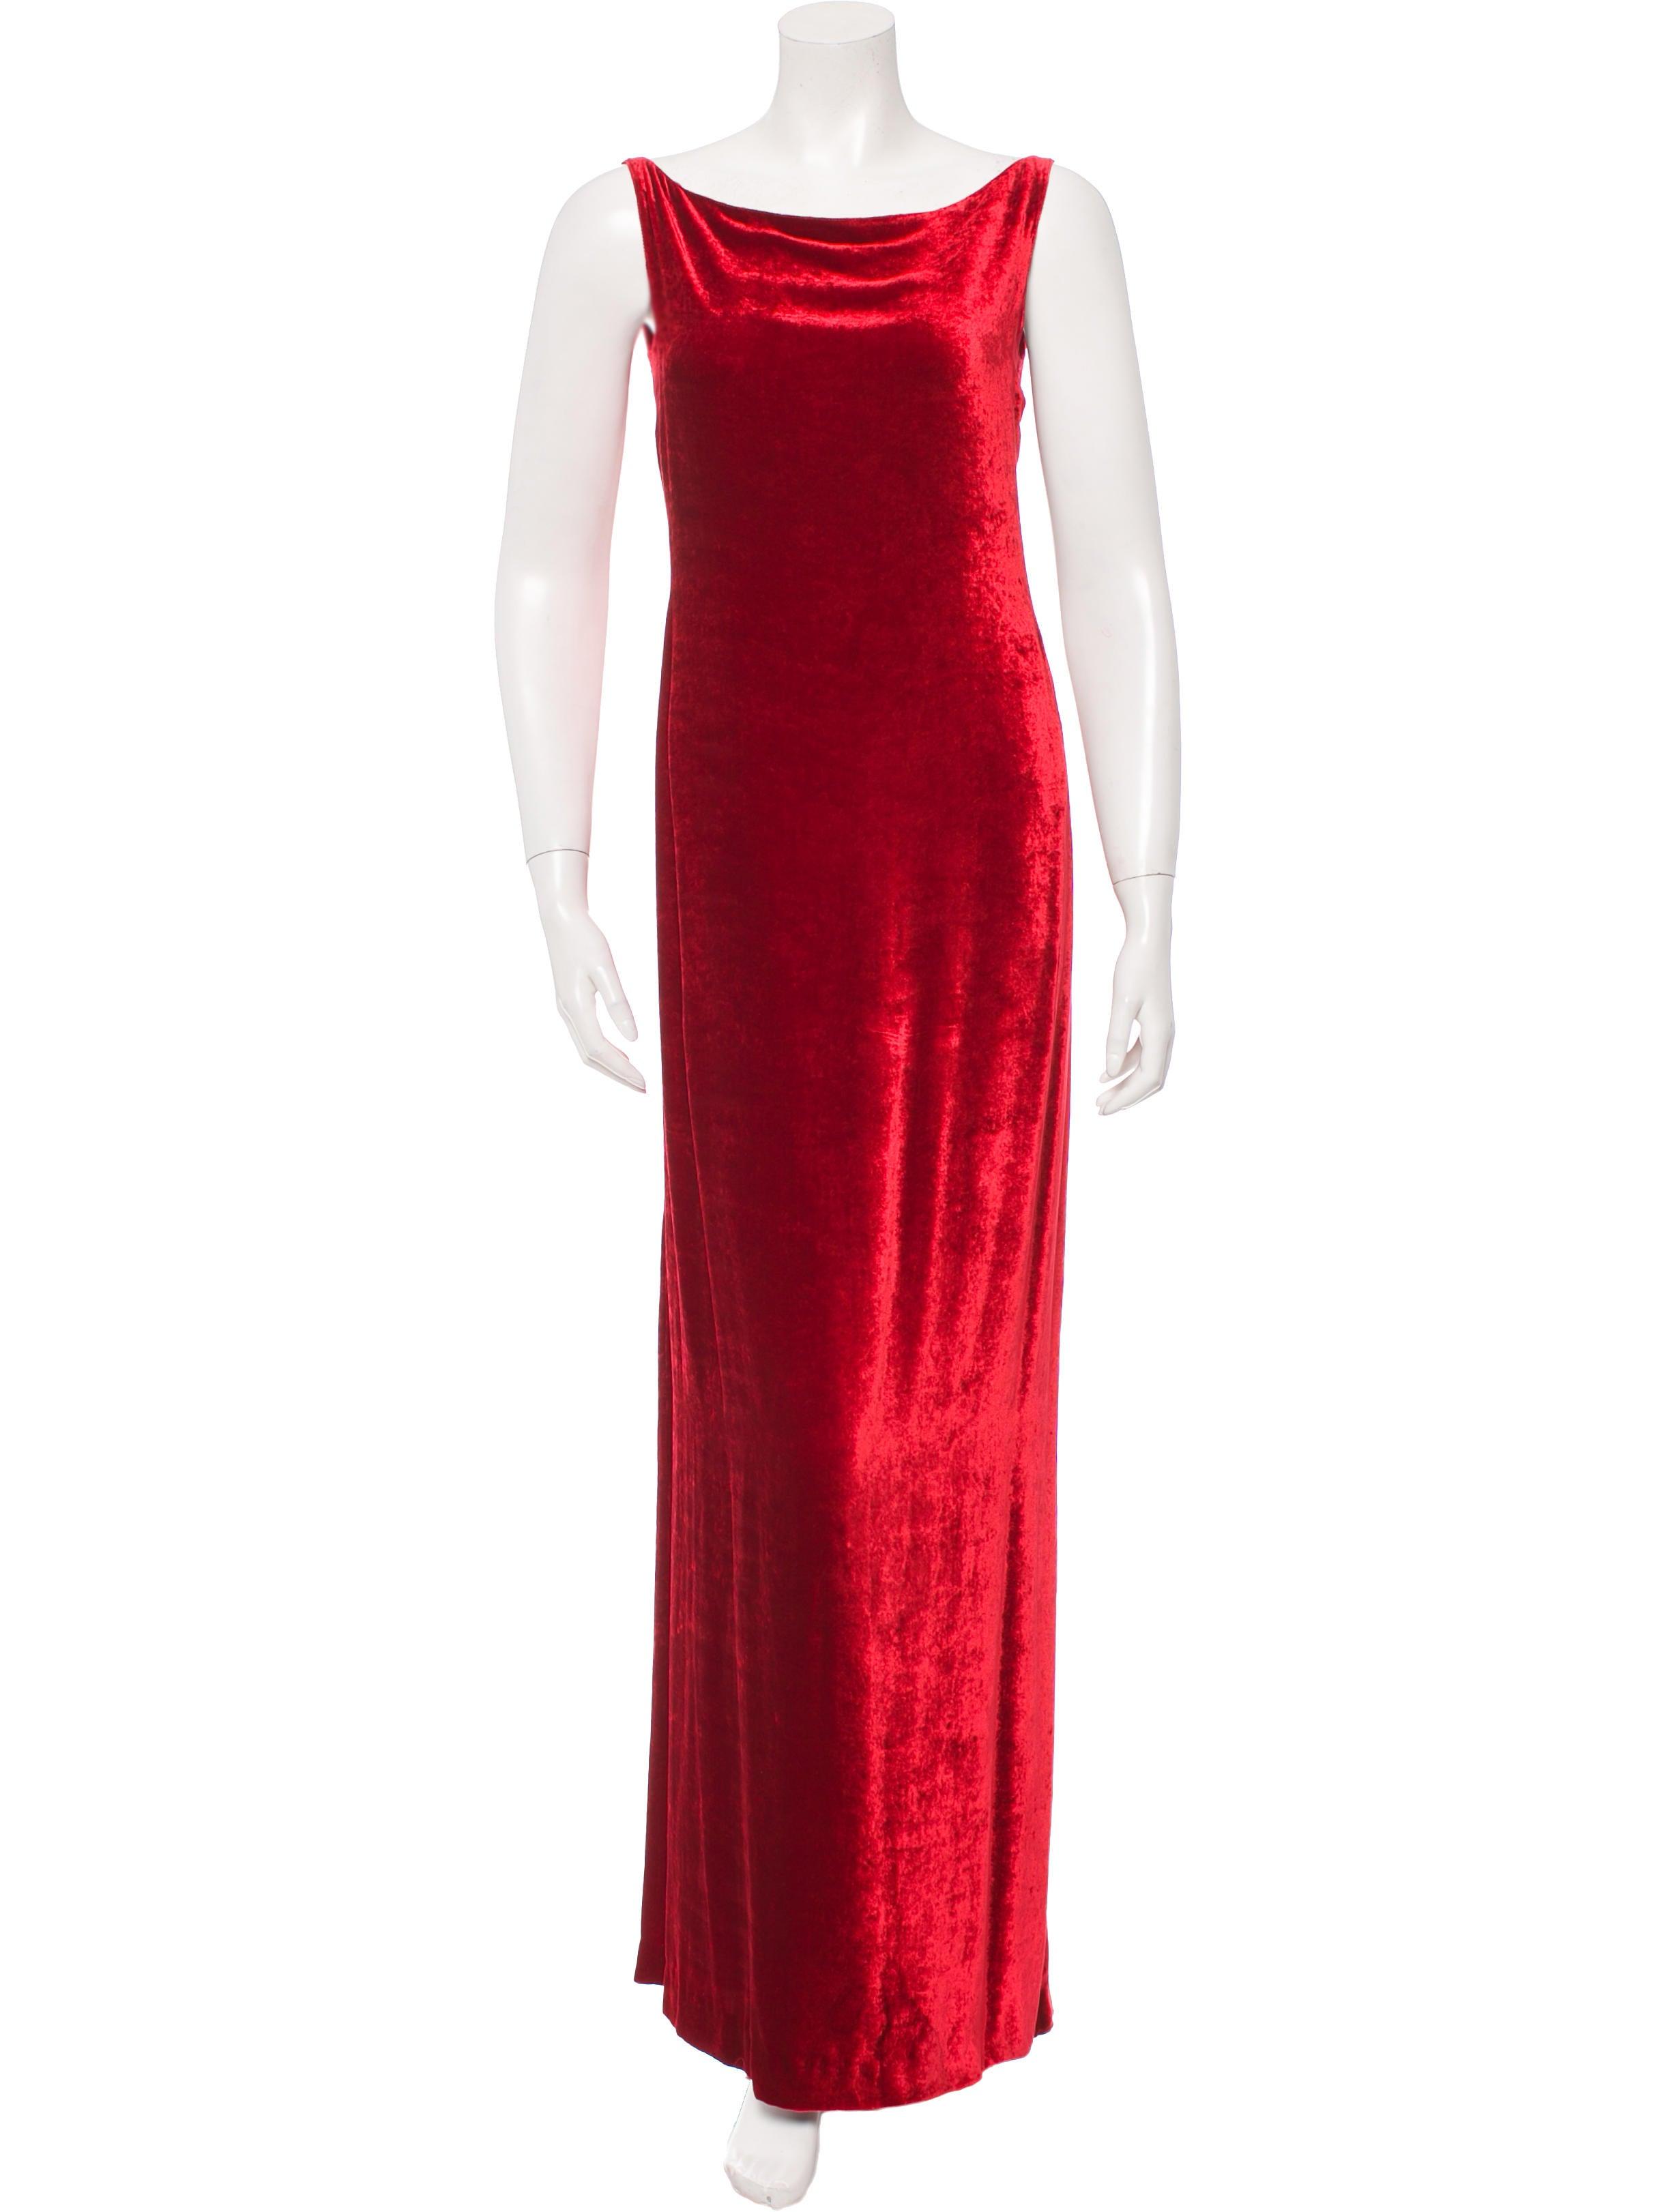 Donna Karan Crushed Velvet Evening Dress Clothing Don21187 The